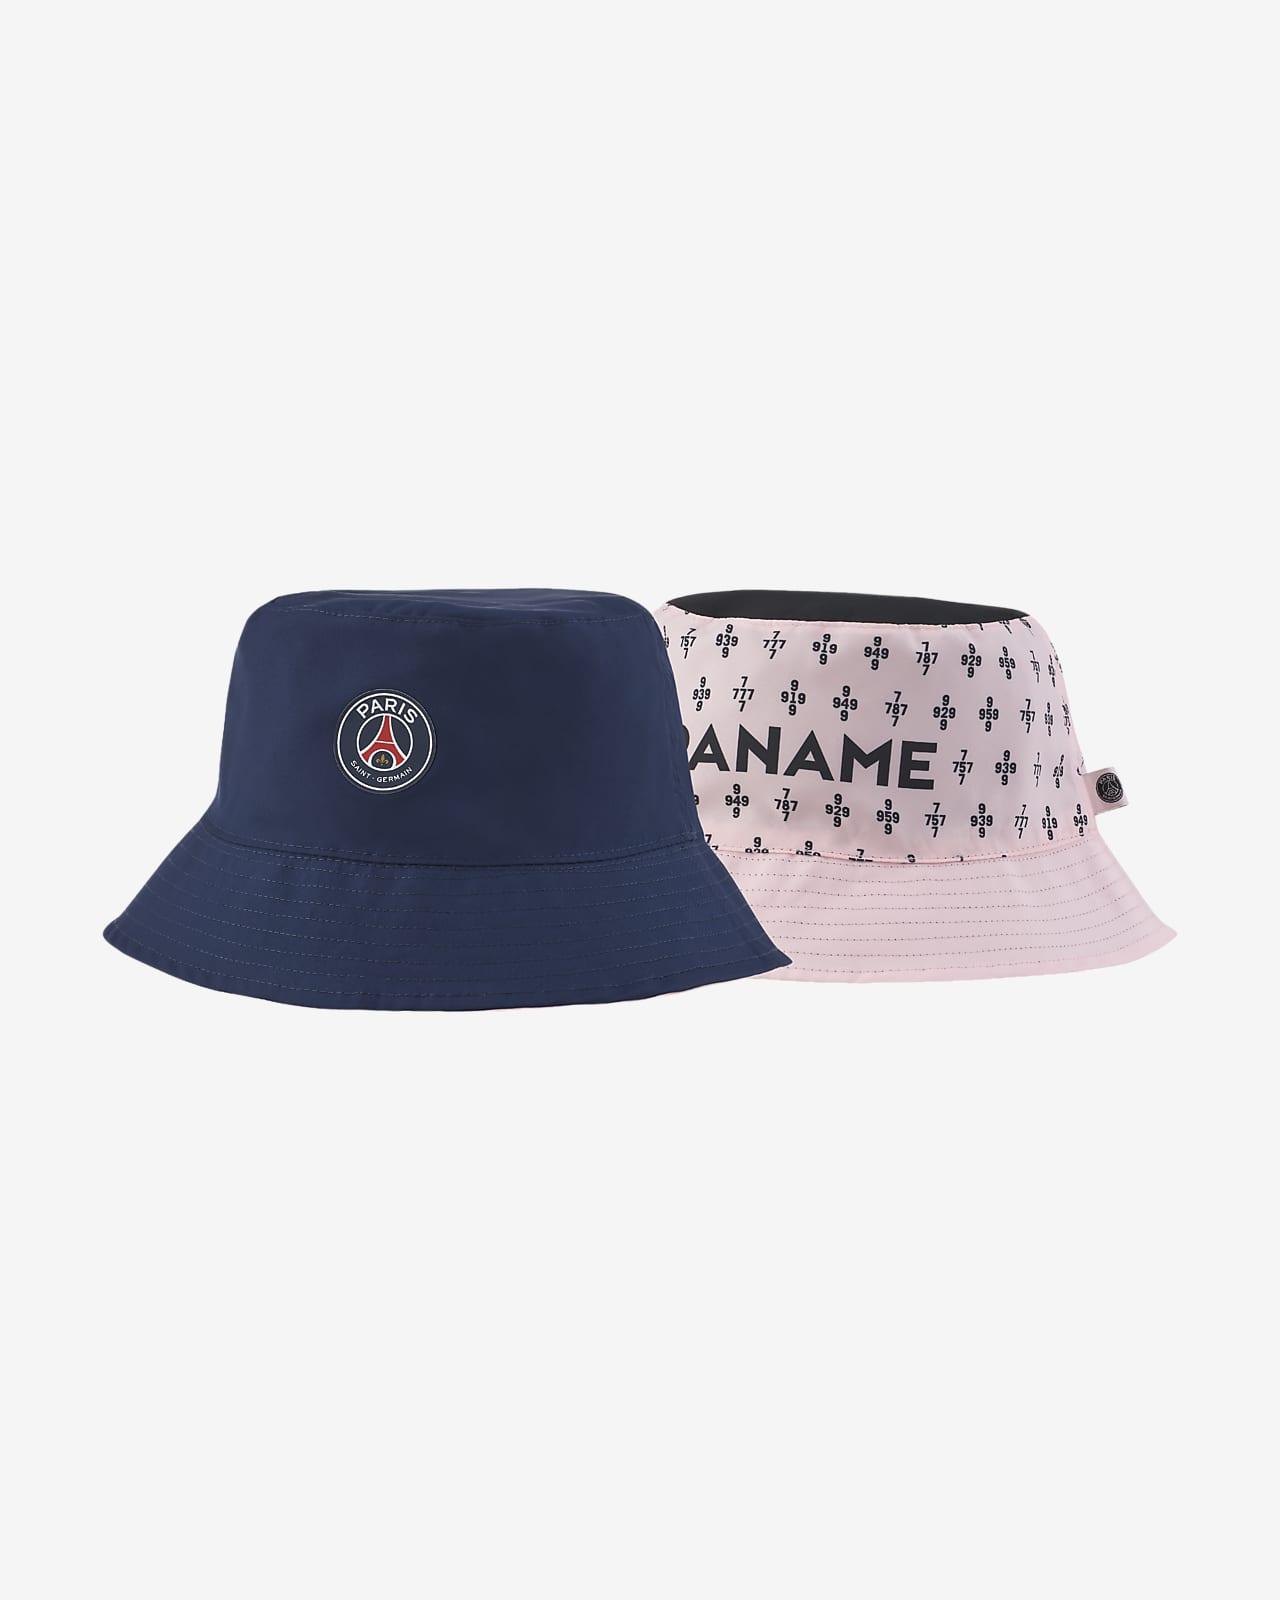 Paris Saint-Germain Reversible Bucket Hat